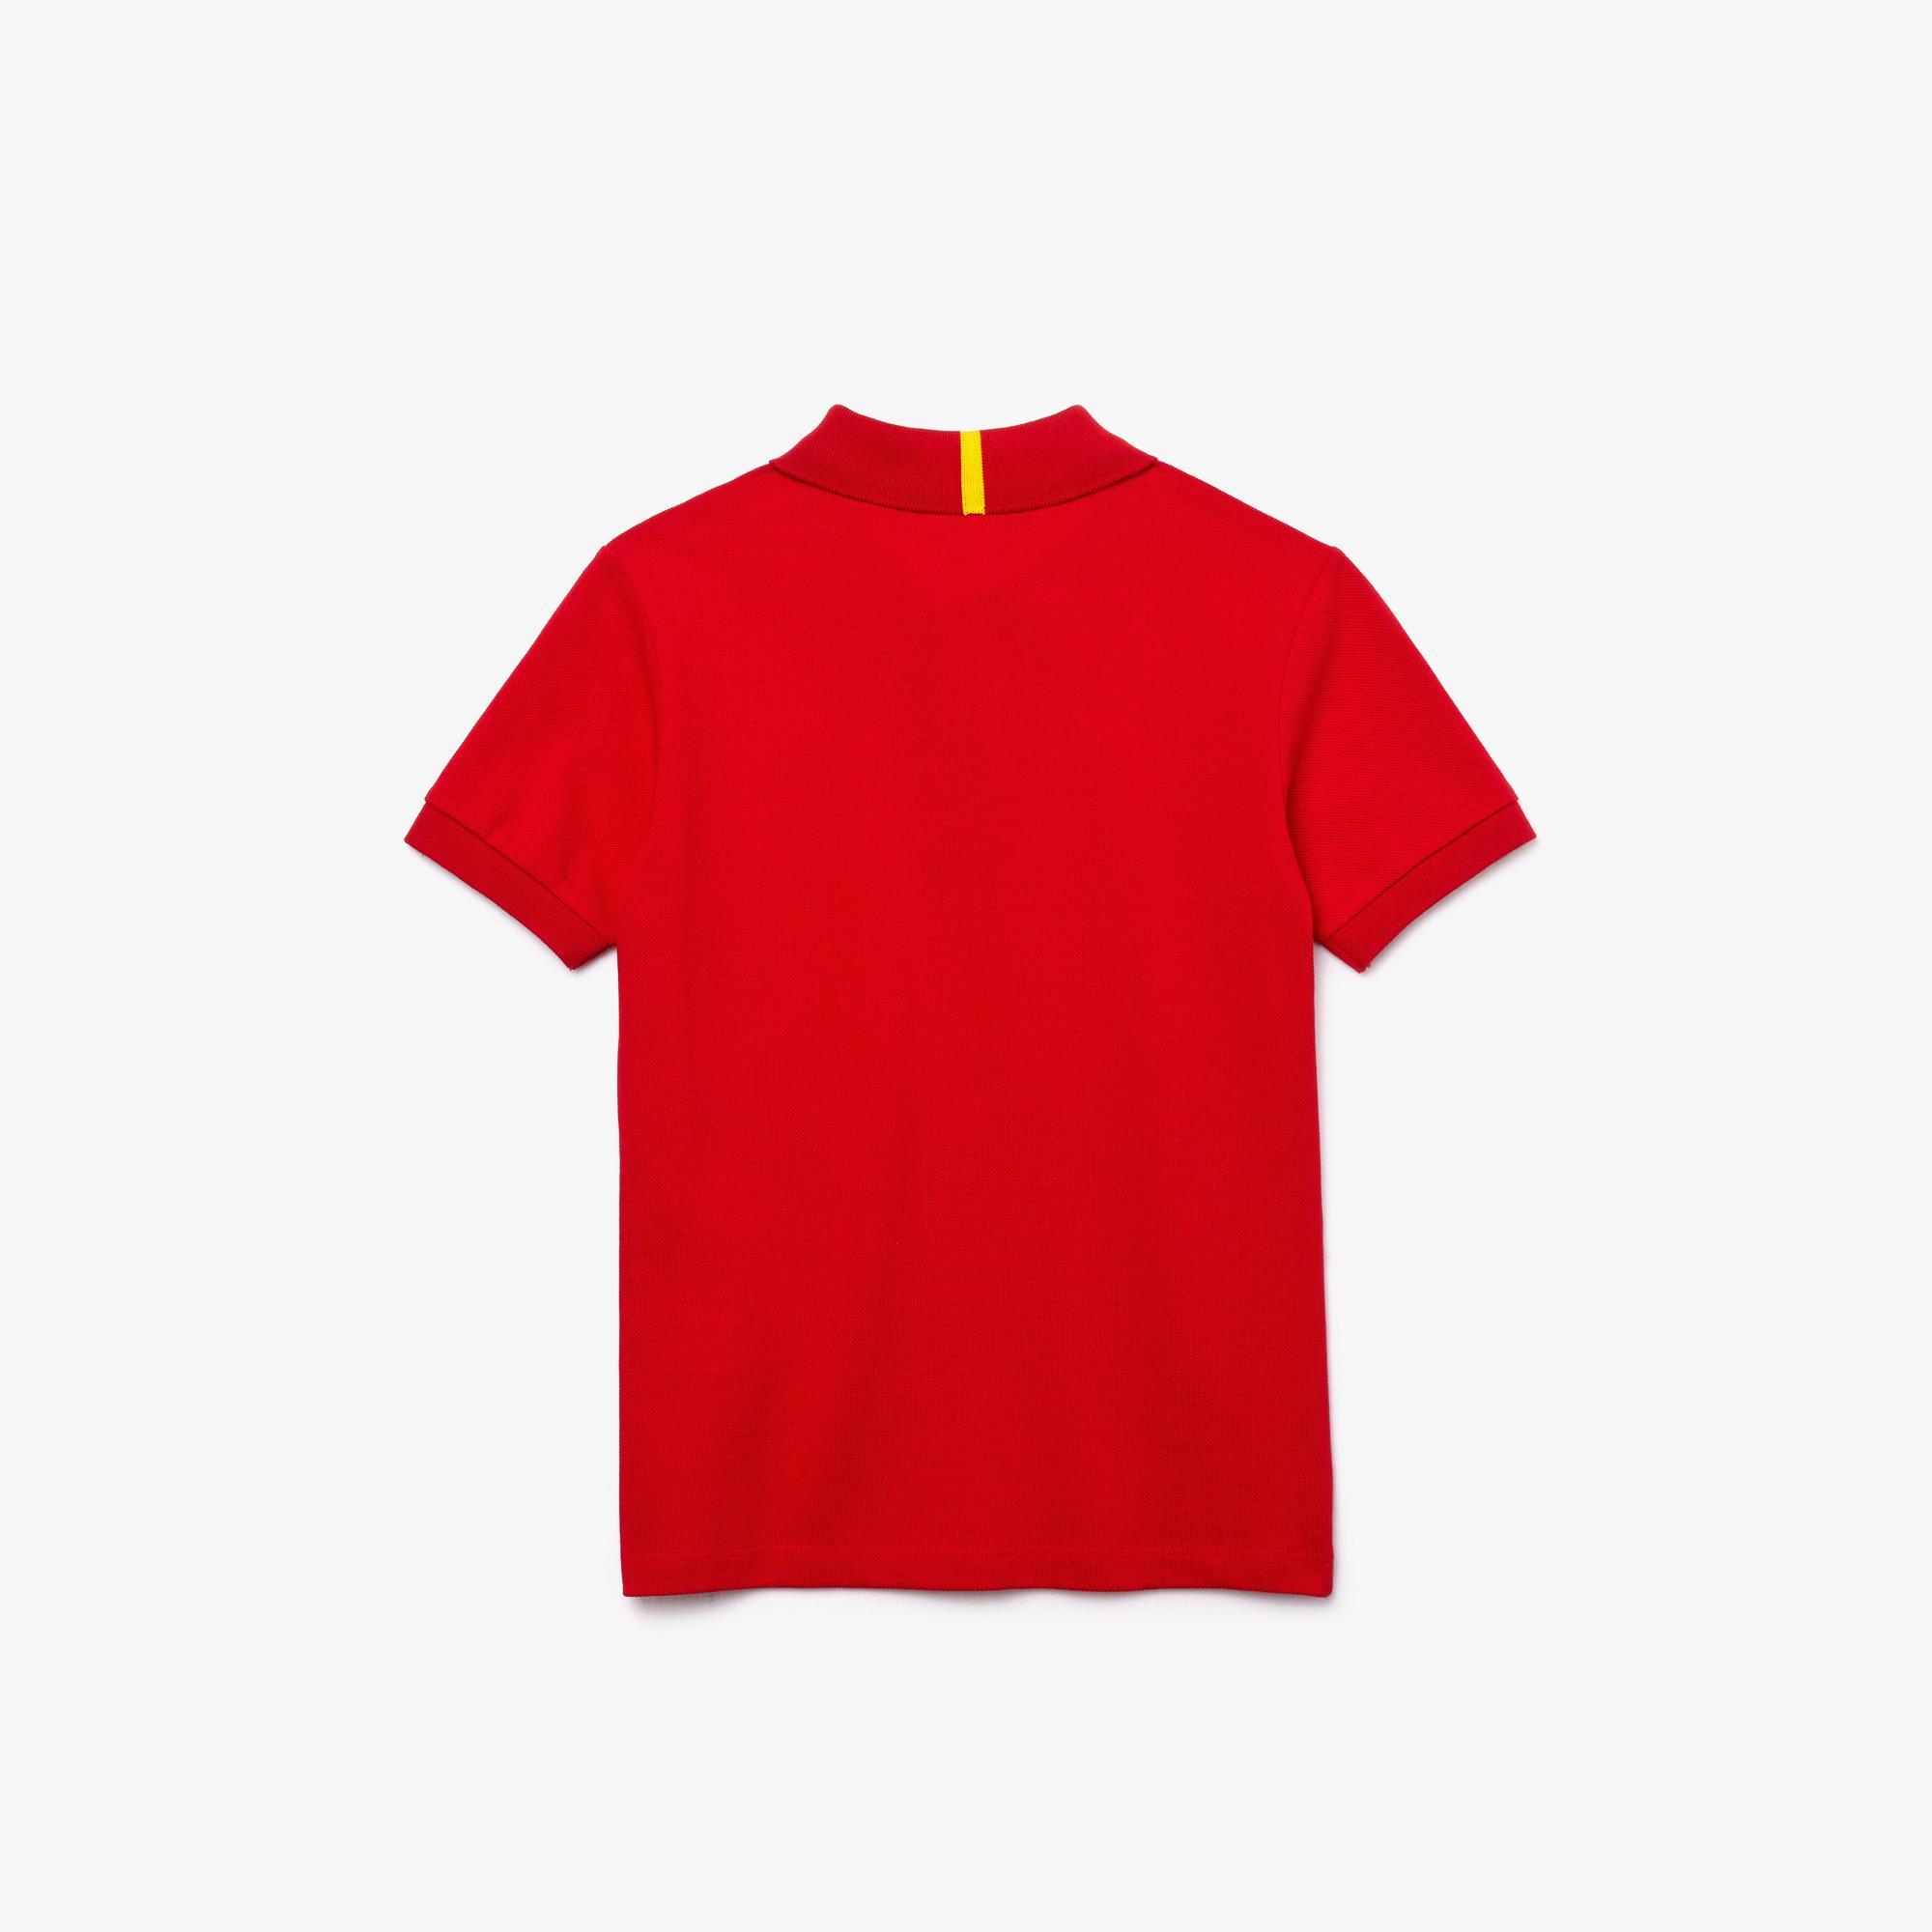 Lacoste x National Geographic Çocuk Kırmızı Polo